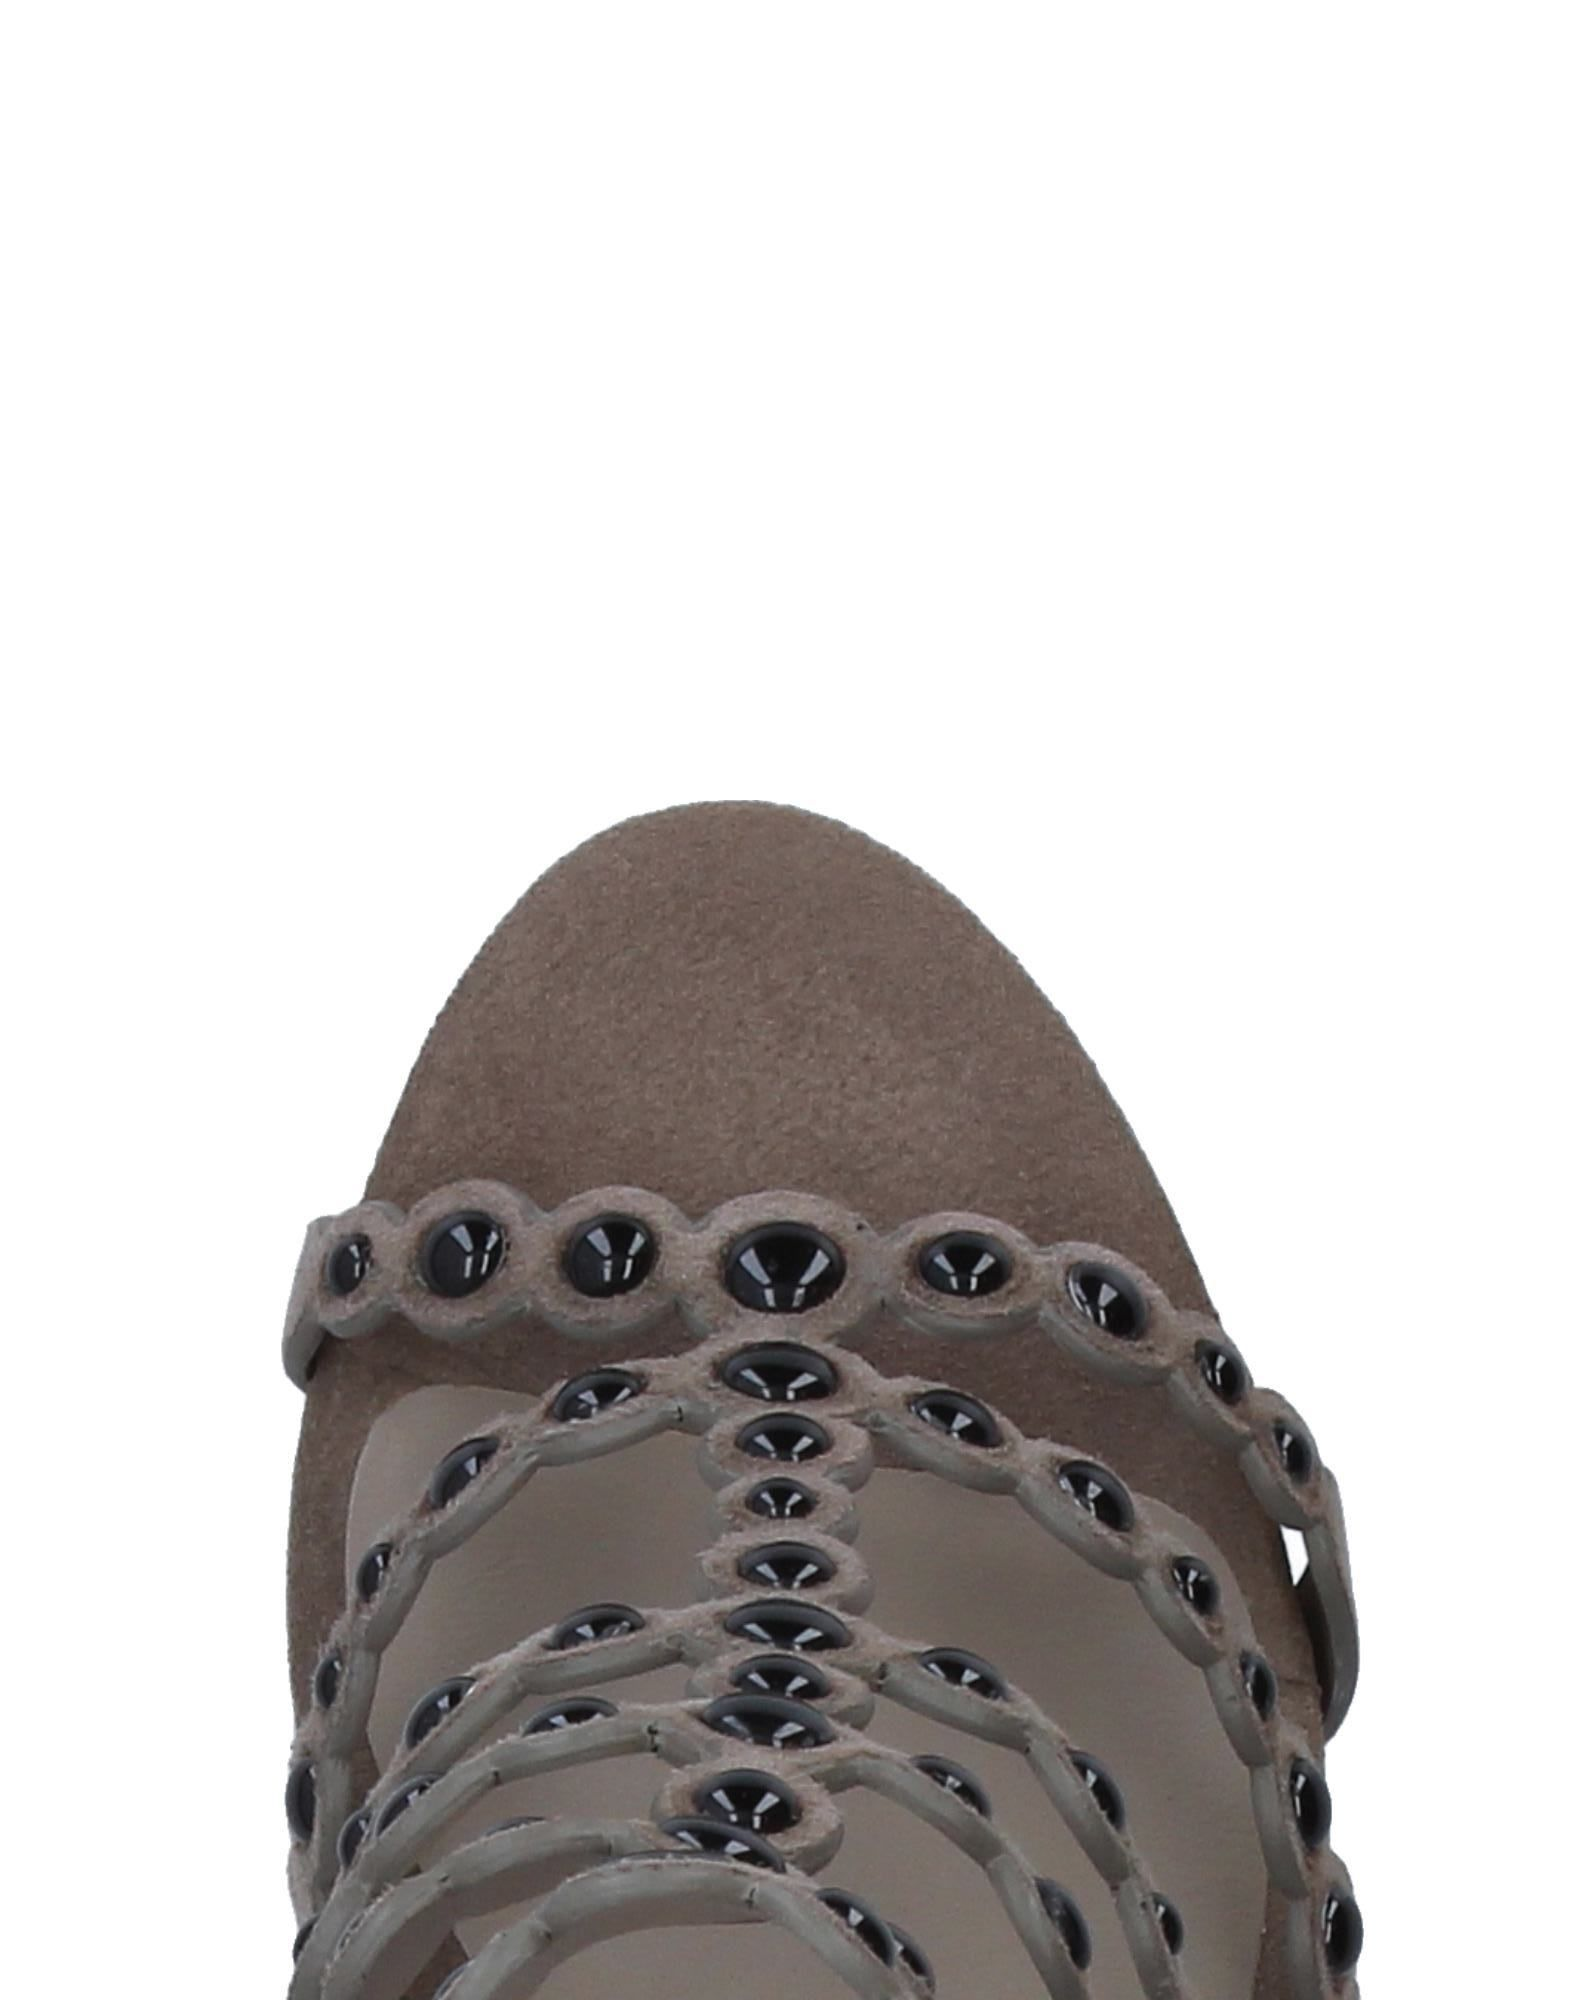 Elvio Zanon Gute Sandalen Damen  11366403VA Gute Zanon Qualität beliebte Schuhe 1f605d